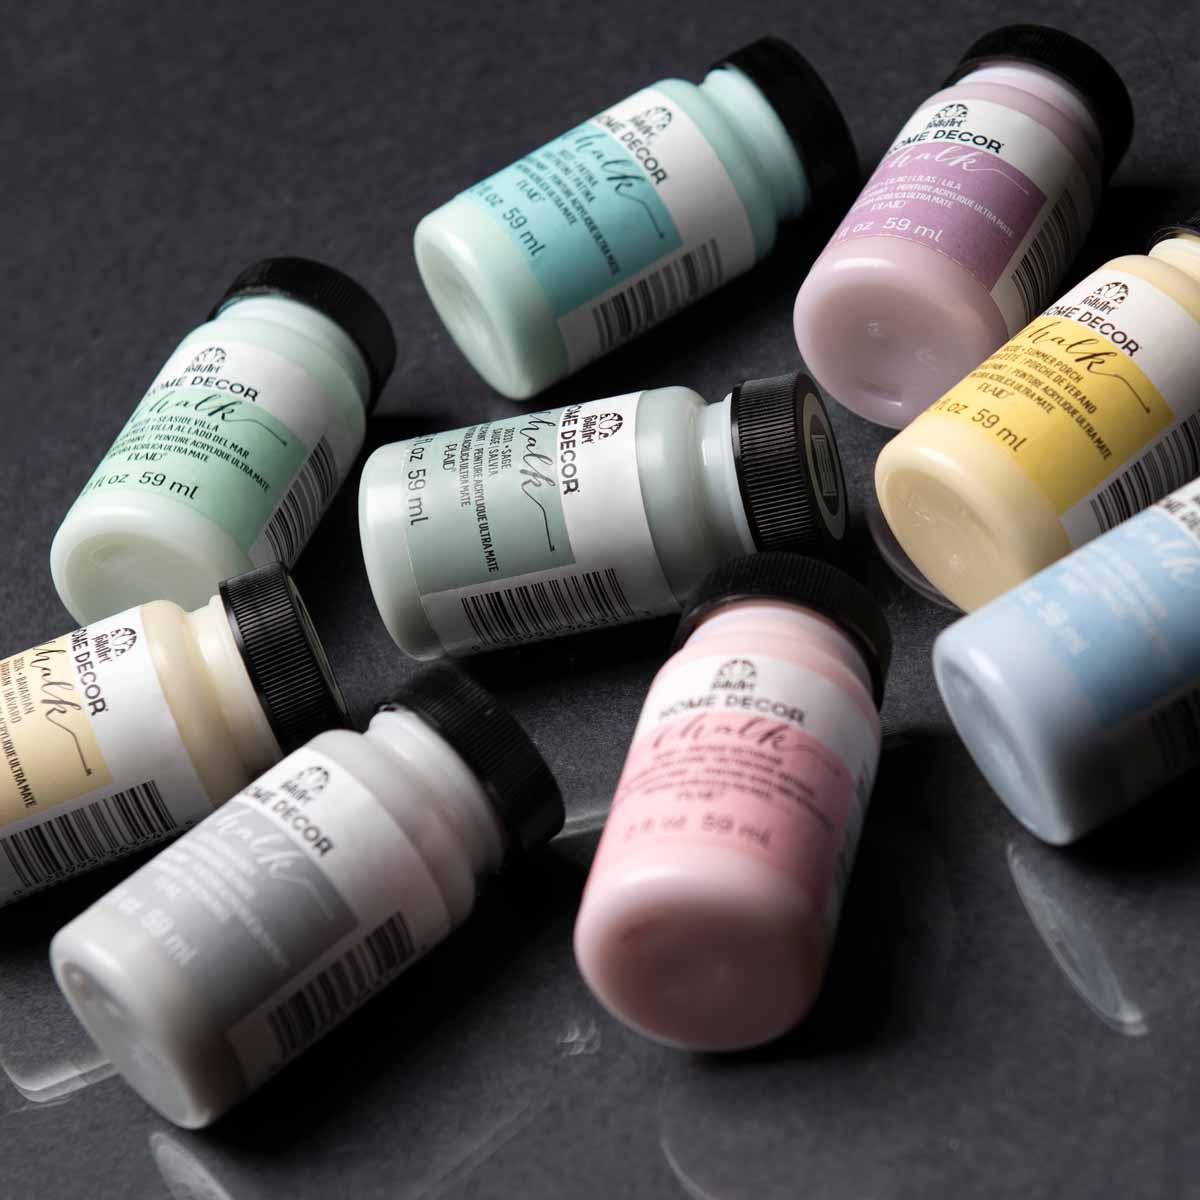 FolkArt ® Home Decor™ Chalk 9 Color Set 2 - PROMOFAHDC2